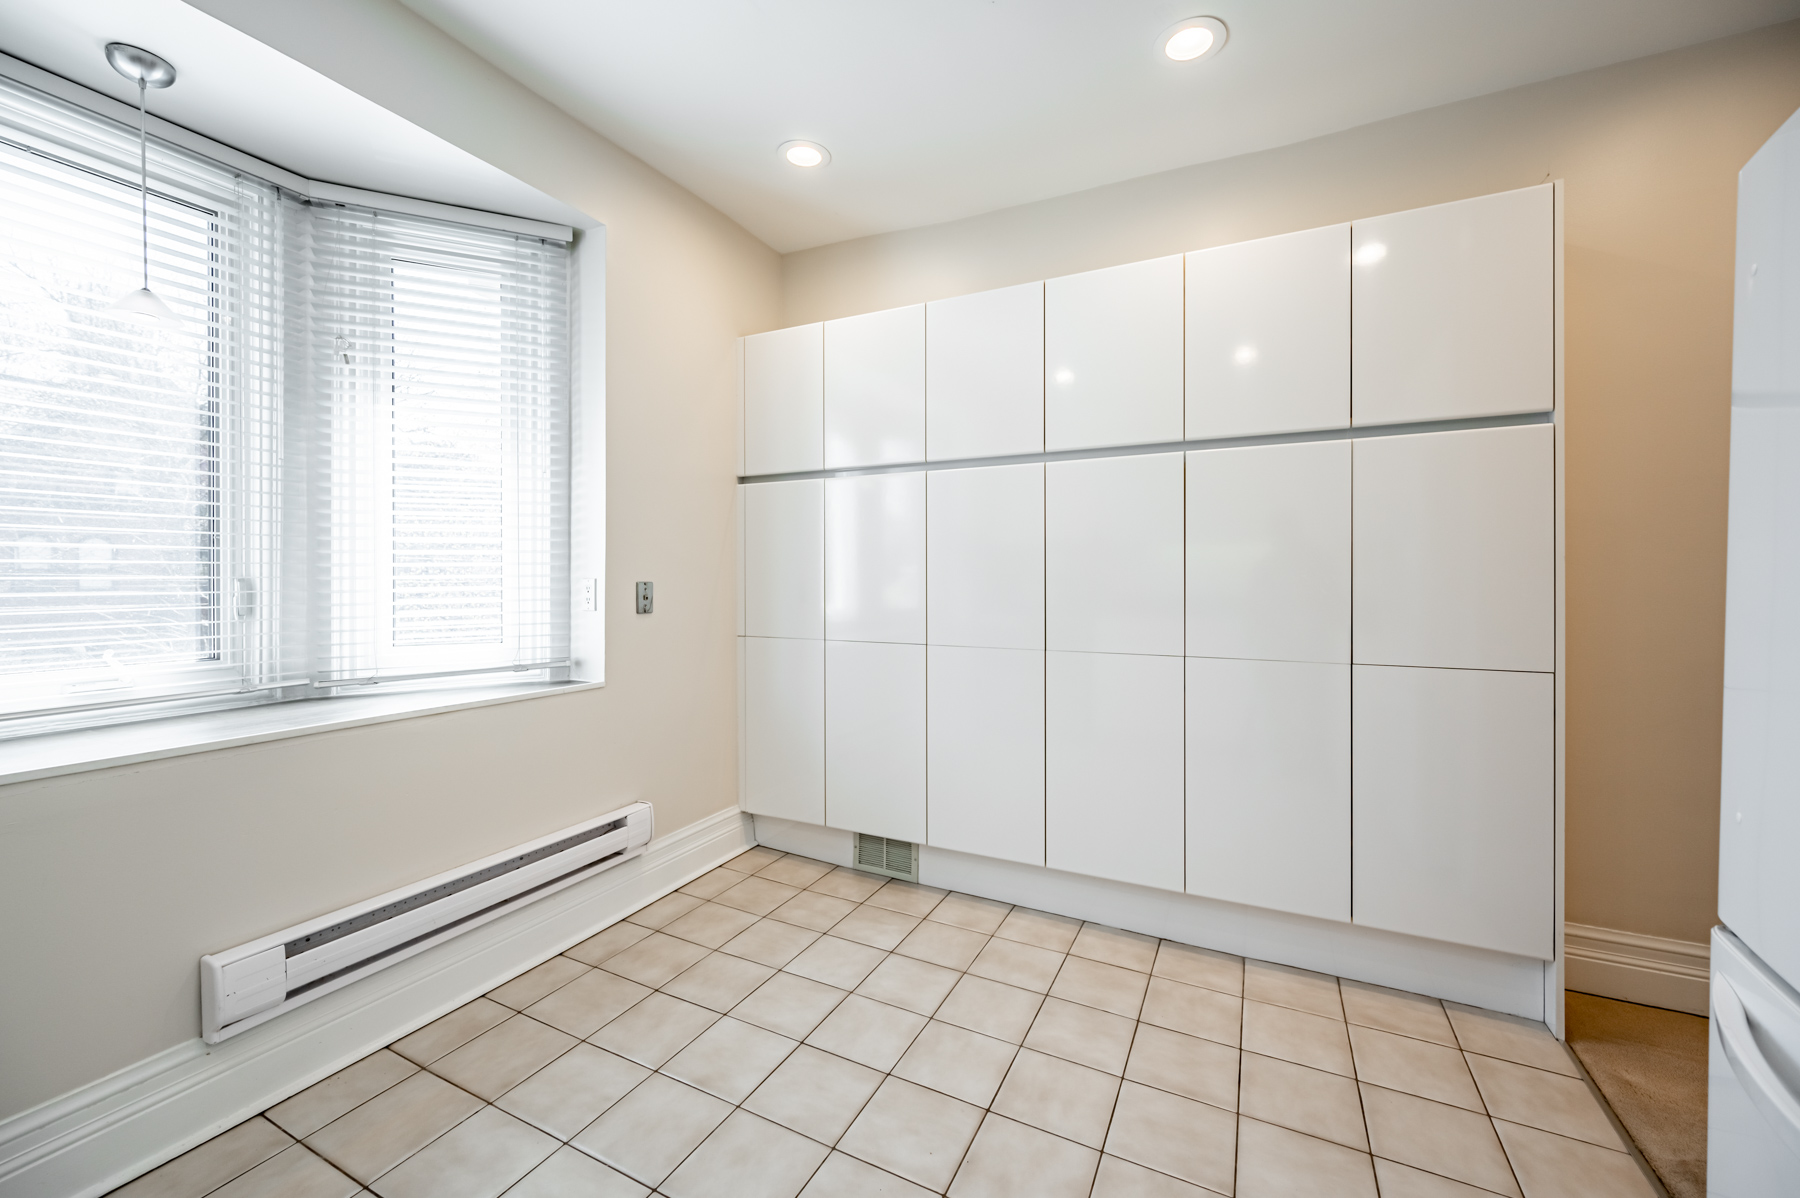 Large empty kitchen.